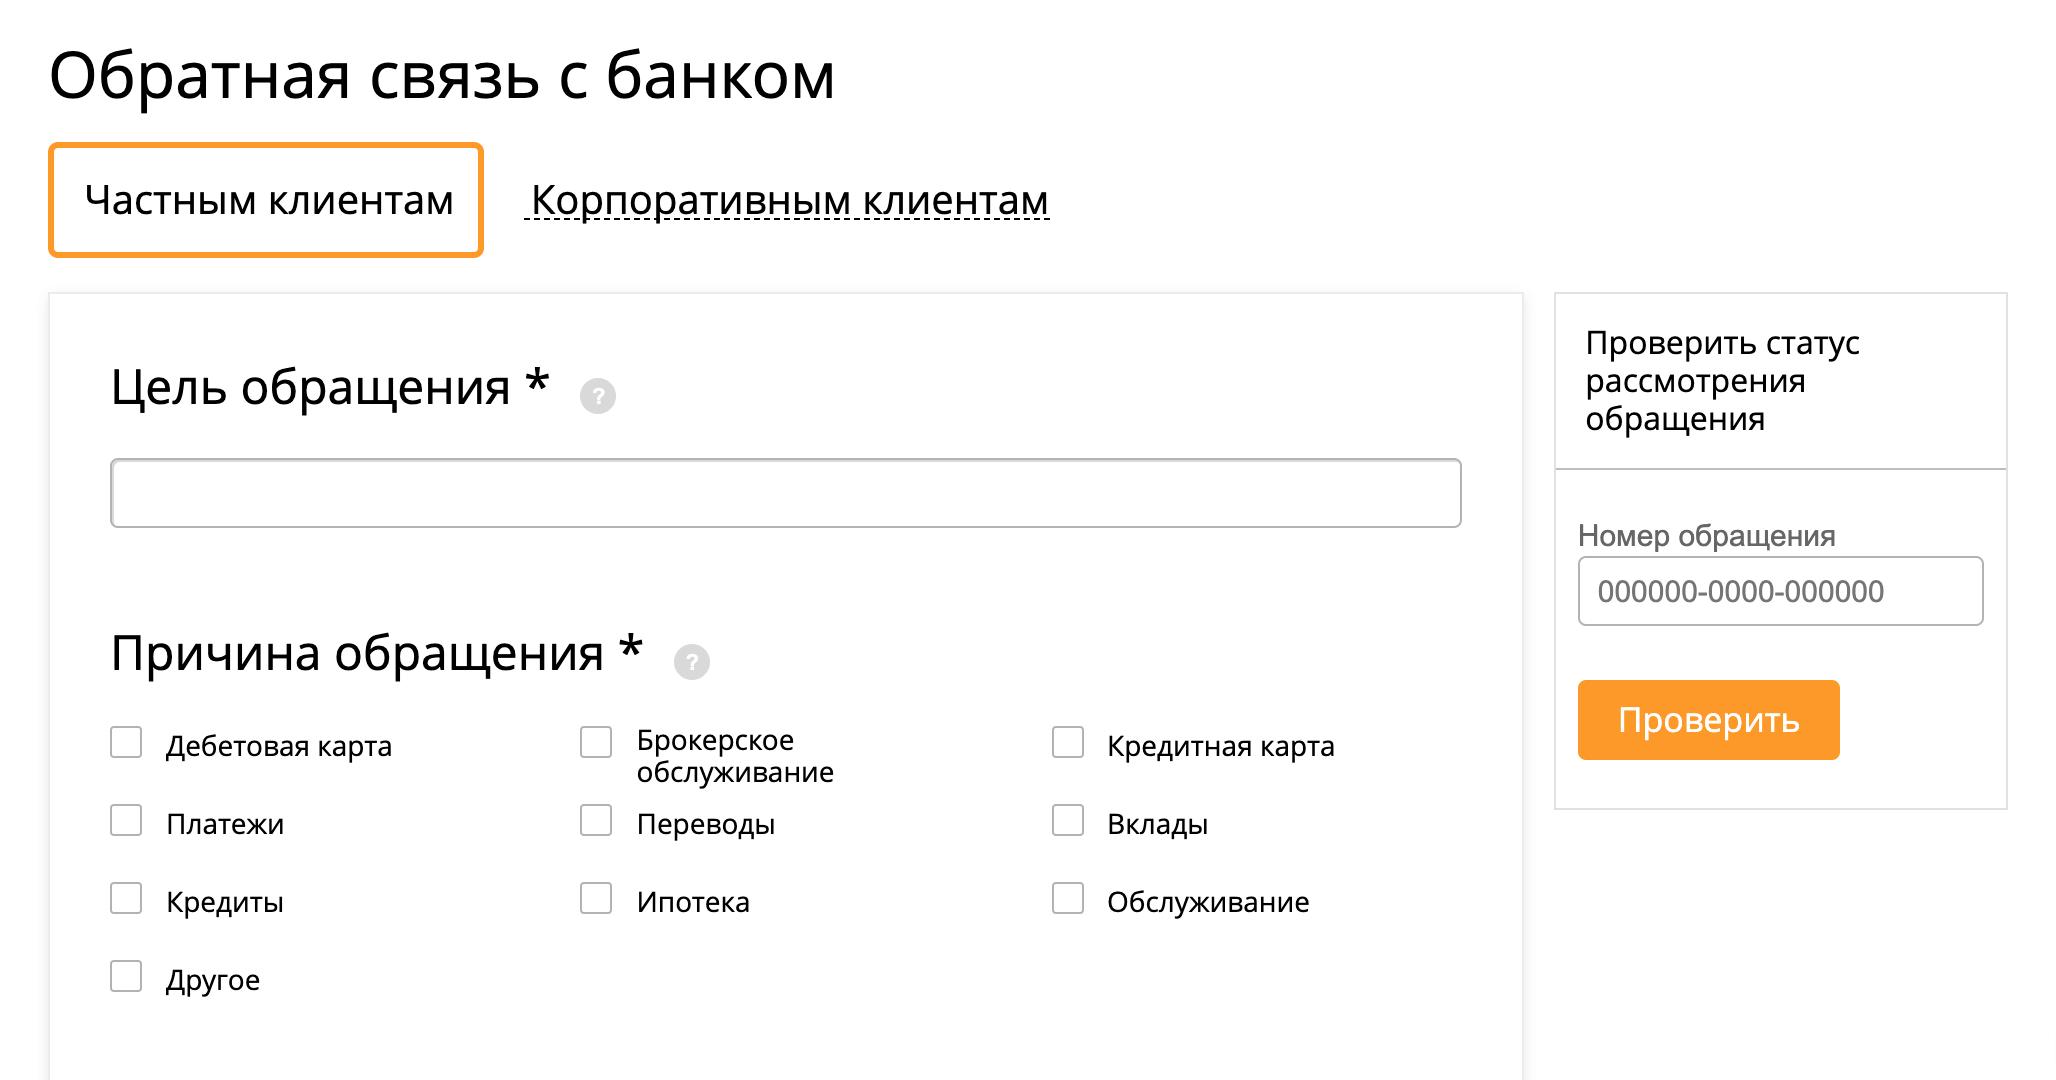 kuda-zhalovatsya-na-sberbank-2